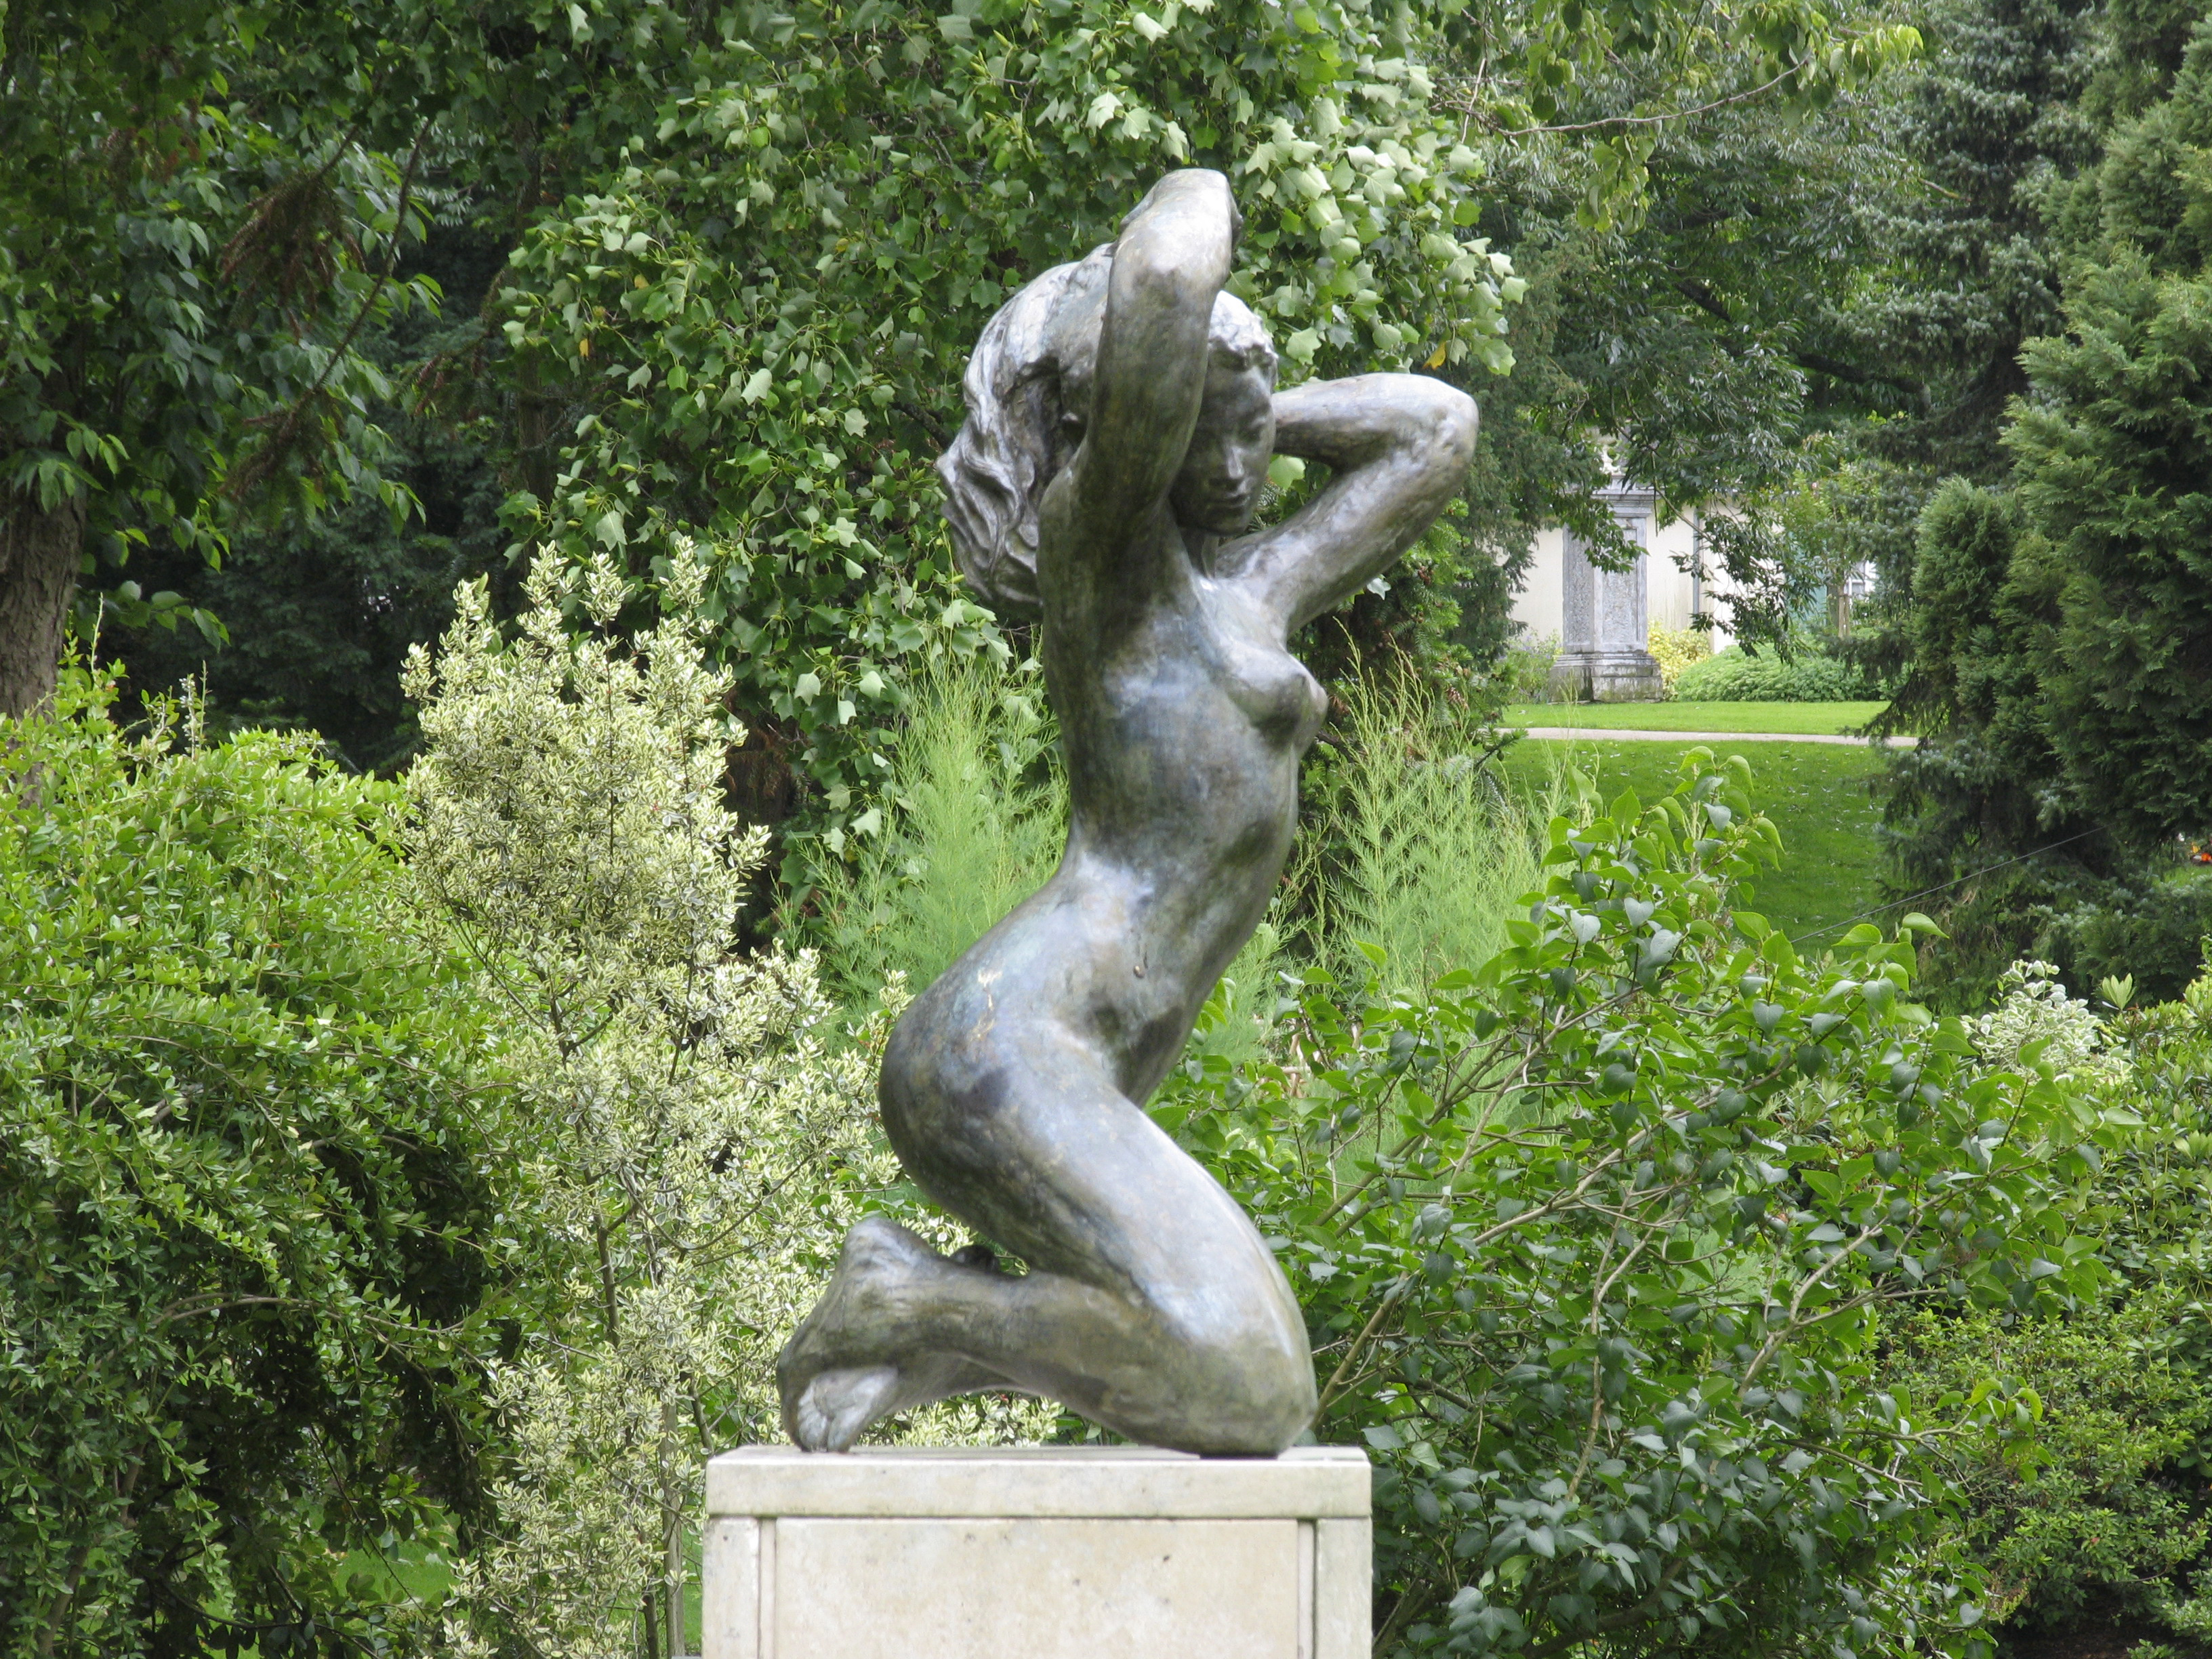 Angers jardin des plantes for Statue moderne pour jardin